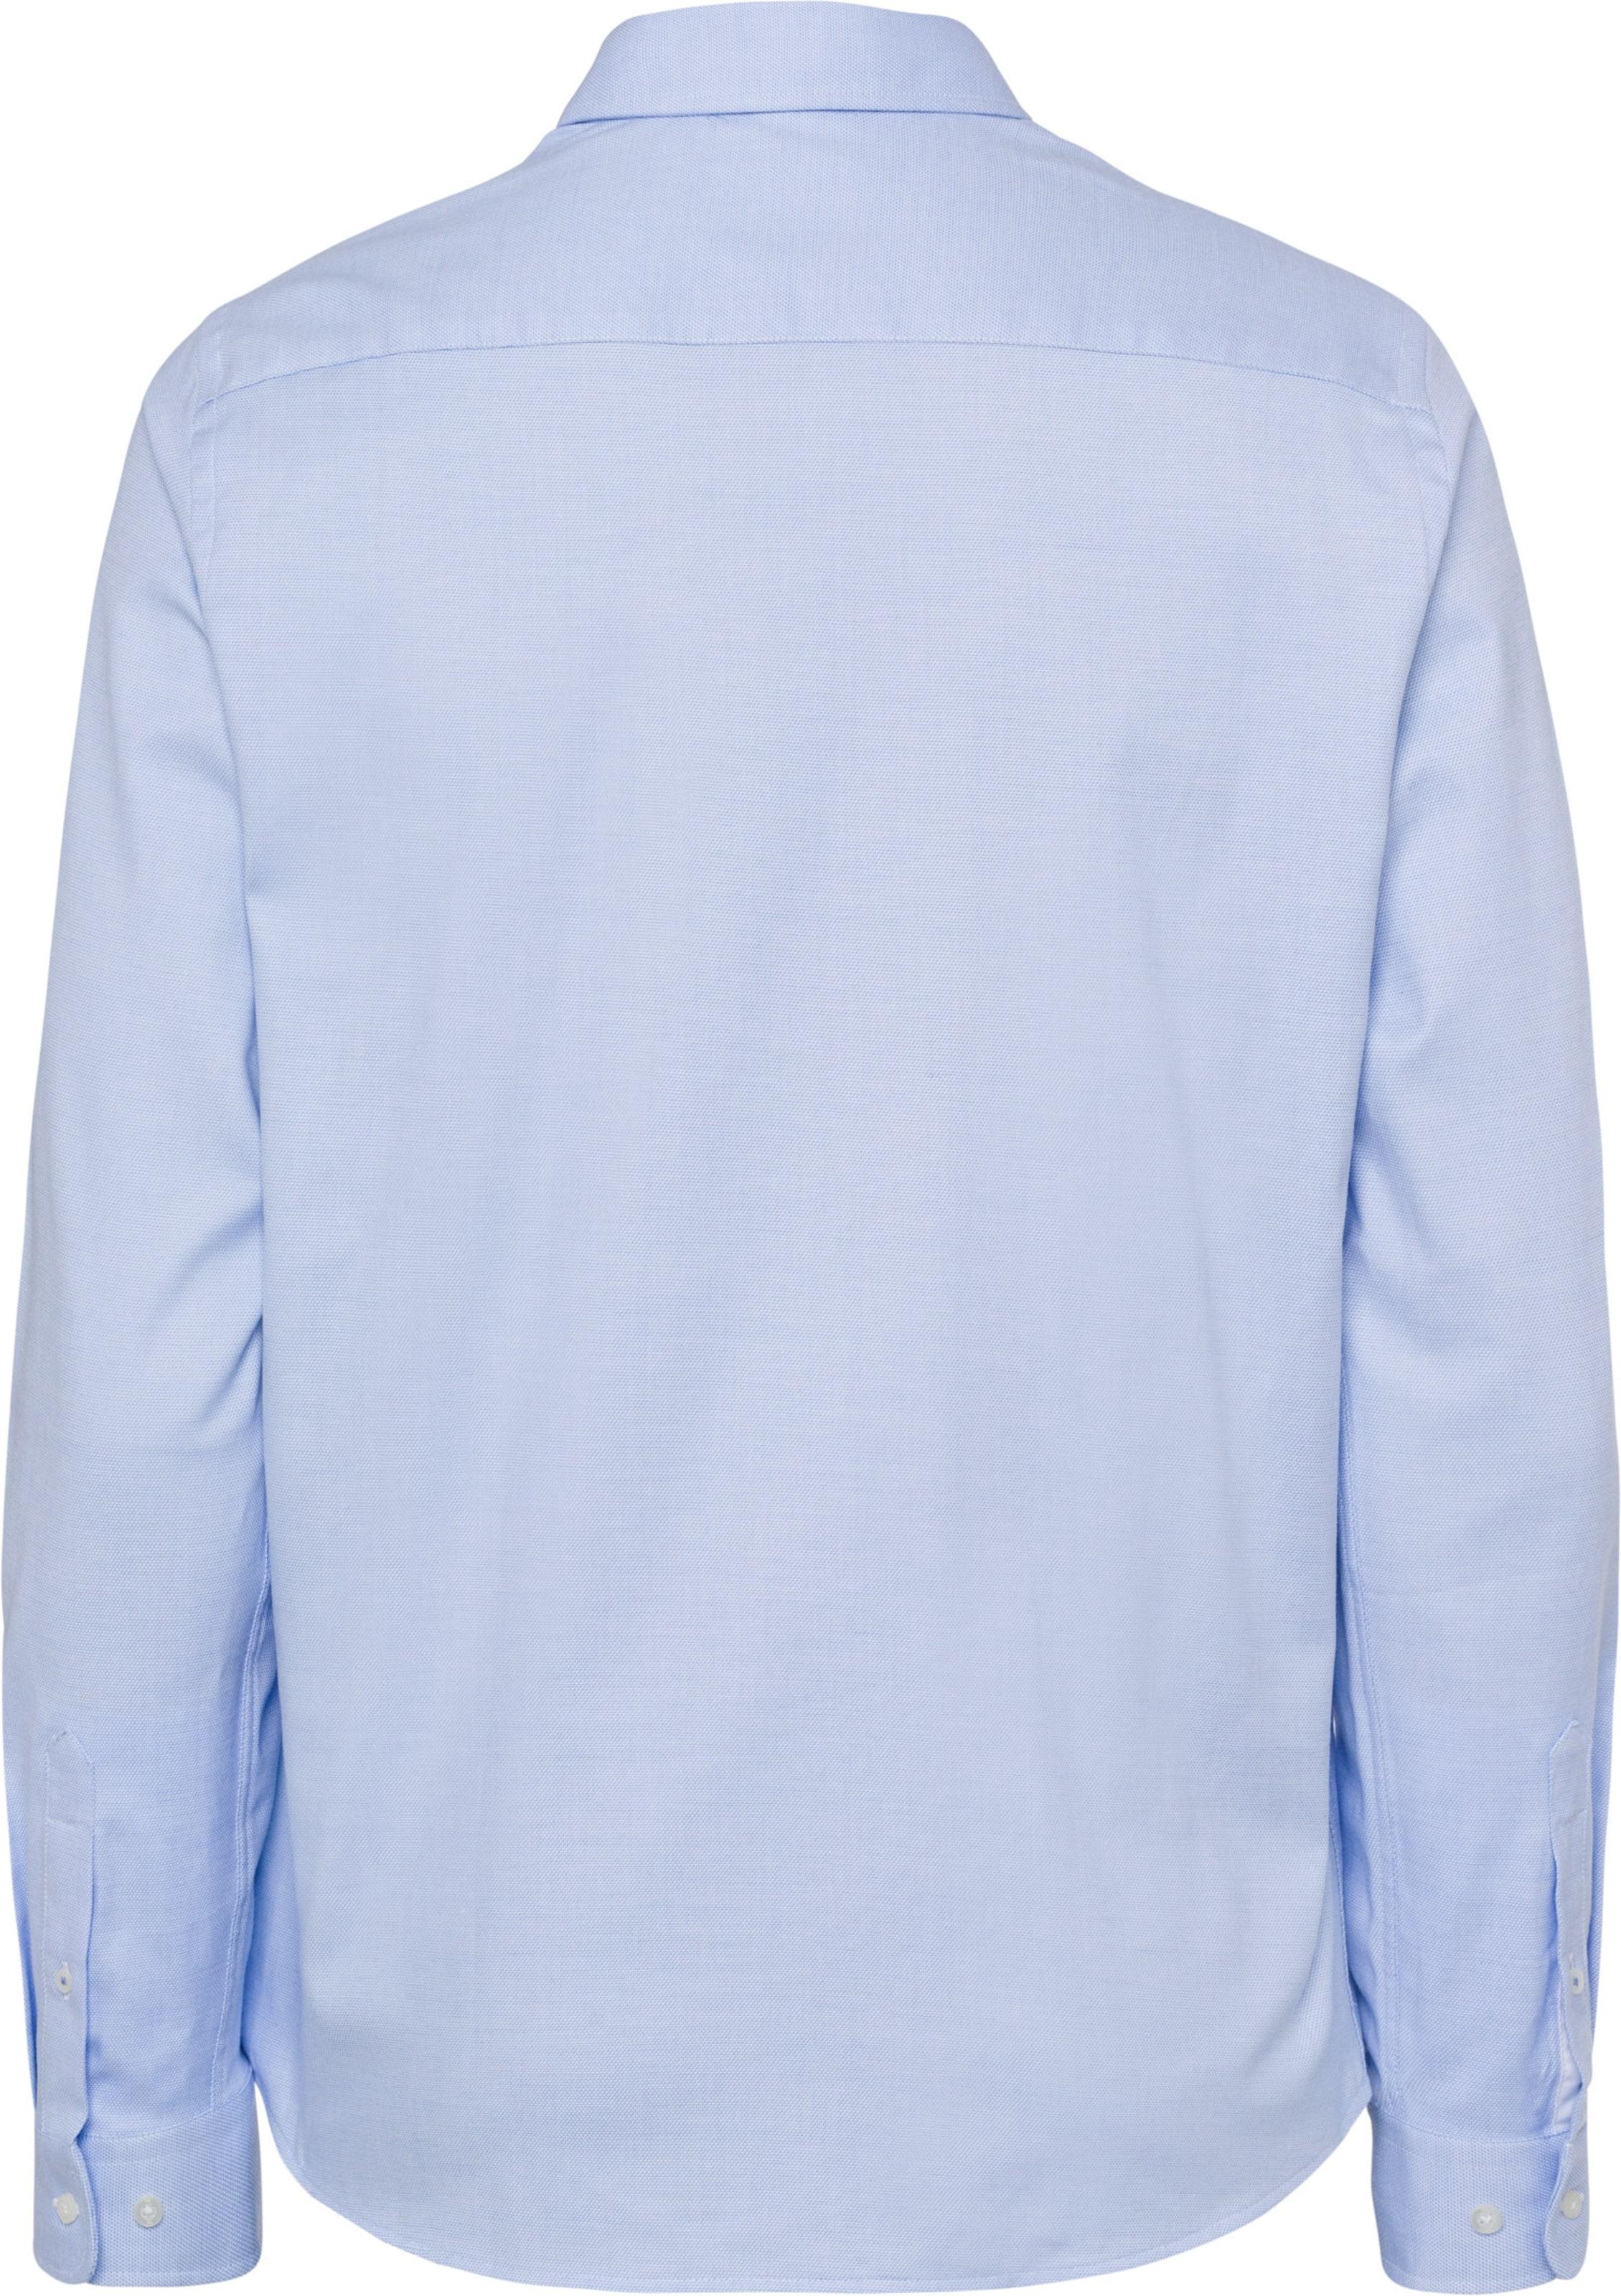 In Style Blau Brax Harold KFcTlJ1